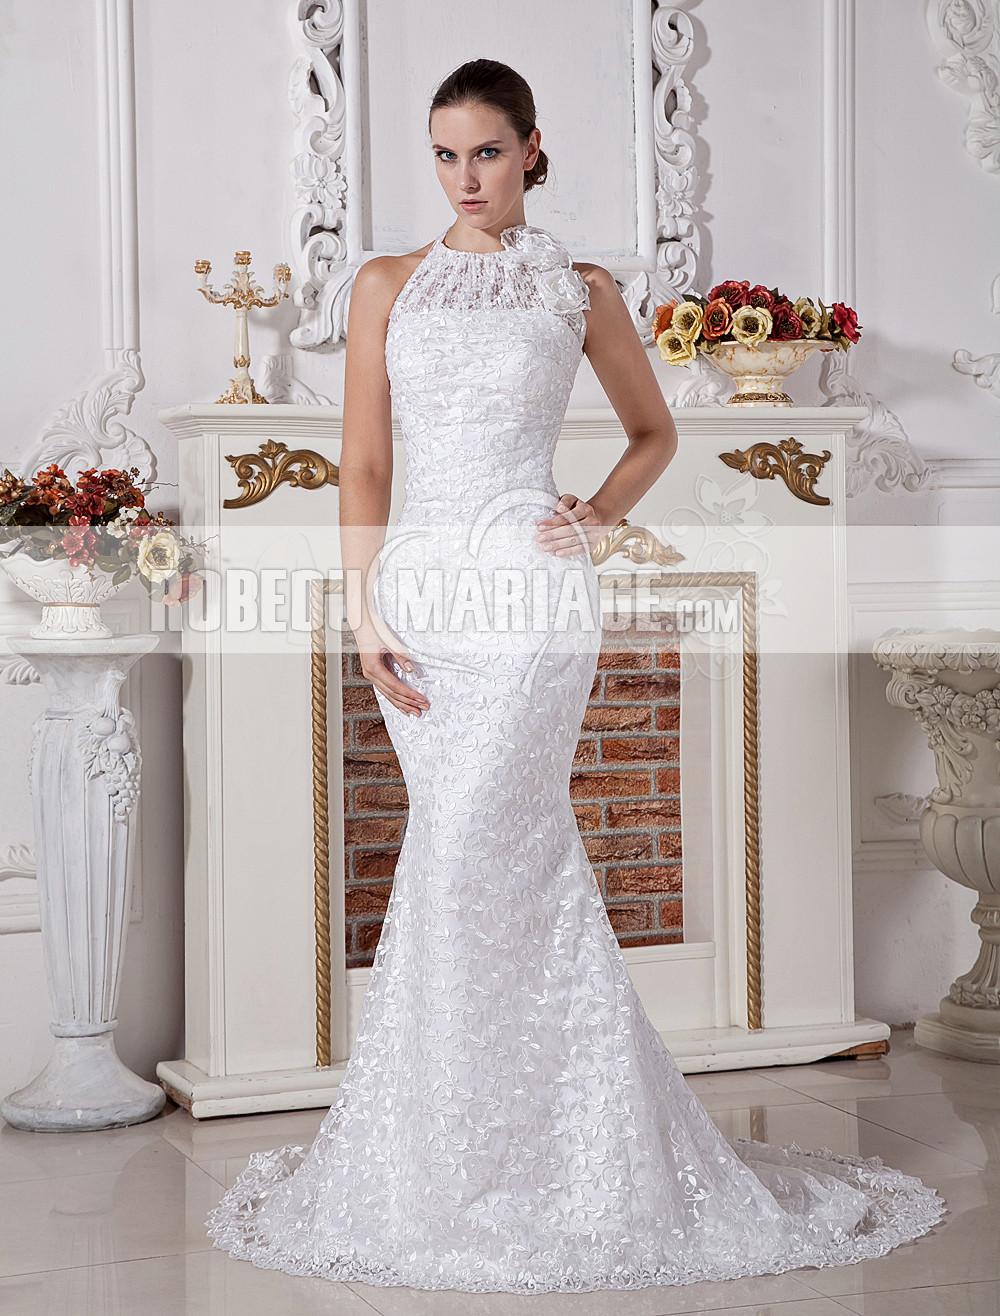 Robe de mariée moderne satin dentelle fleur sirène robe pas cher [# ...